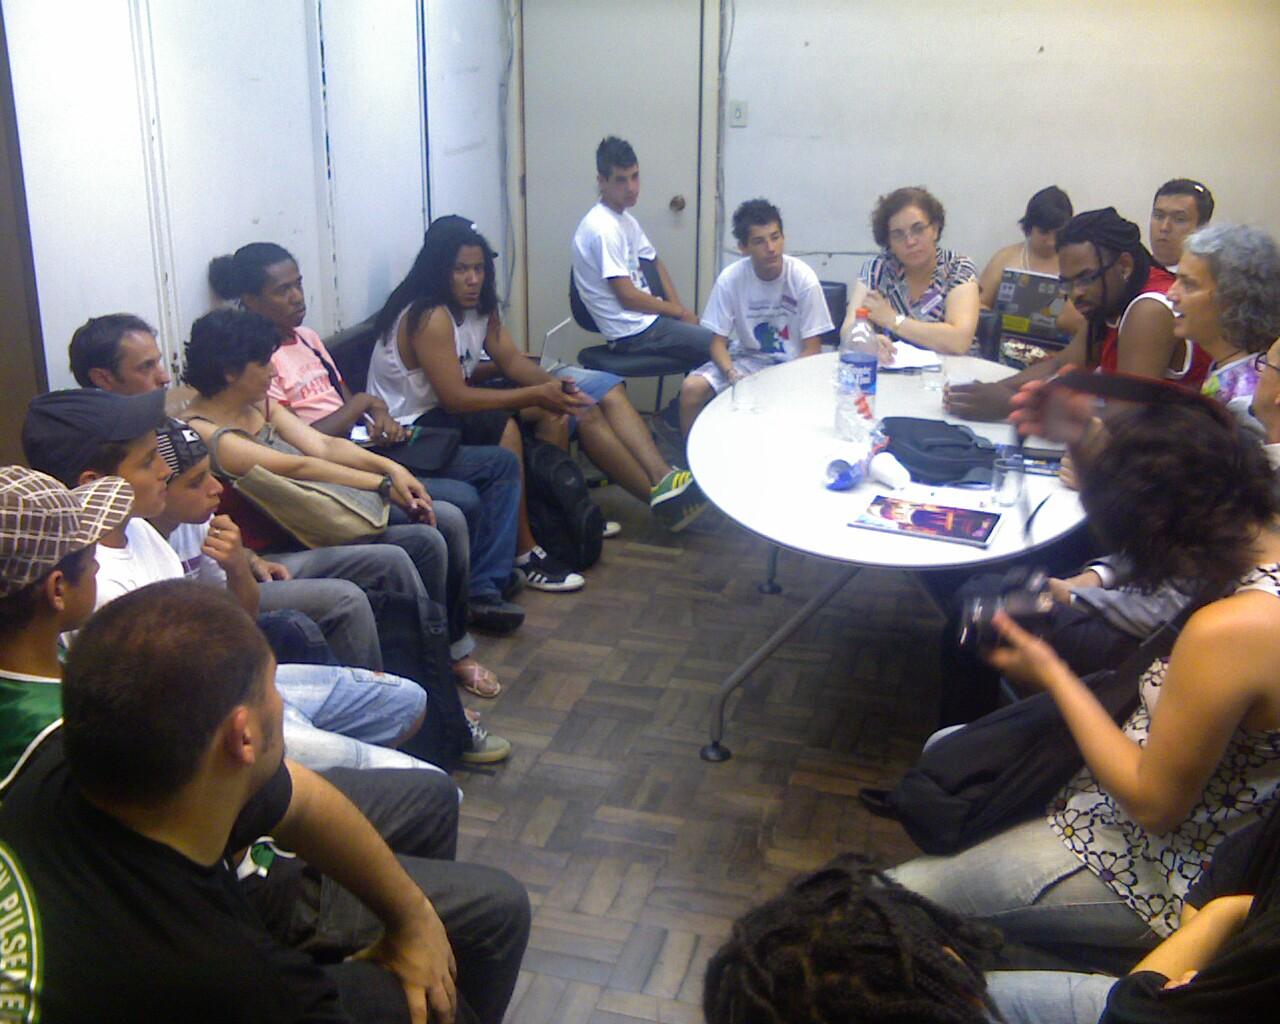 Galerinha reunida #ConexoesGlobais #FSM2012 #MidiaLivre #CulturaDigital